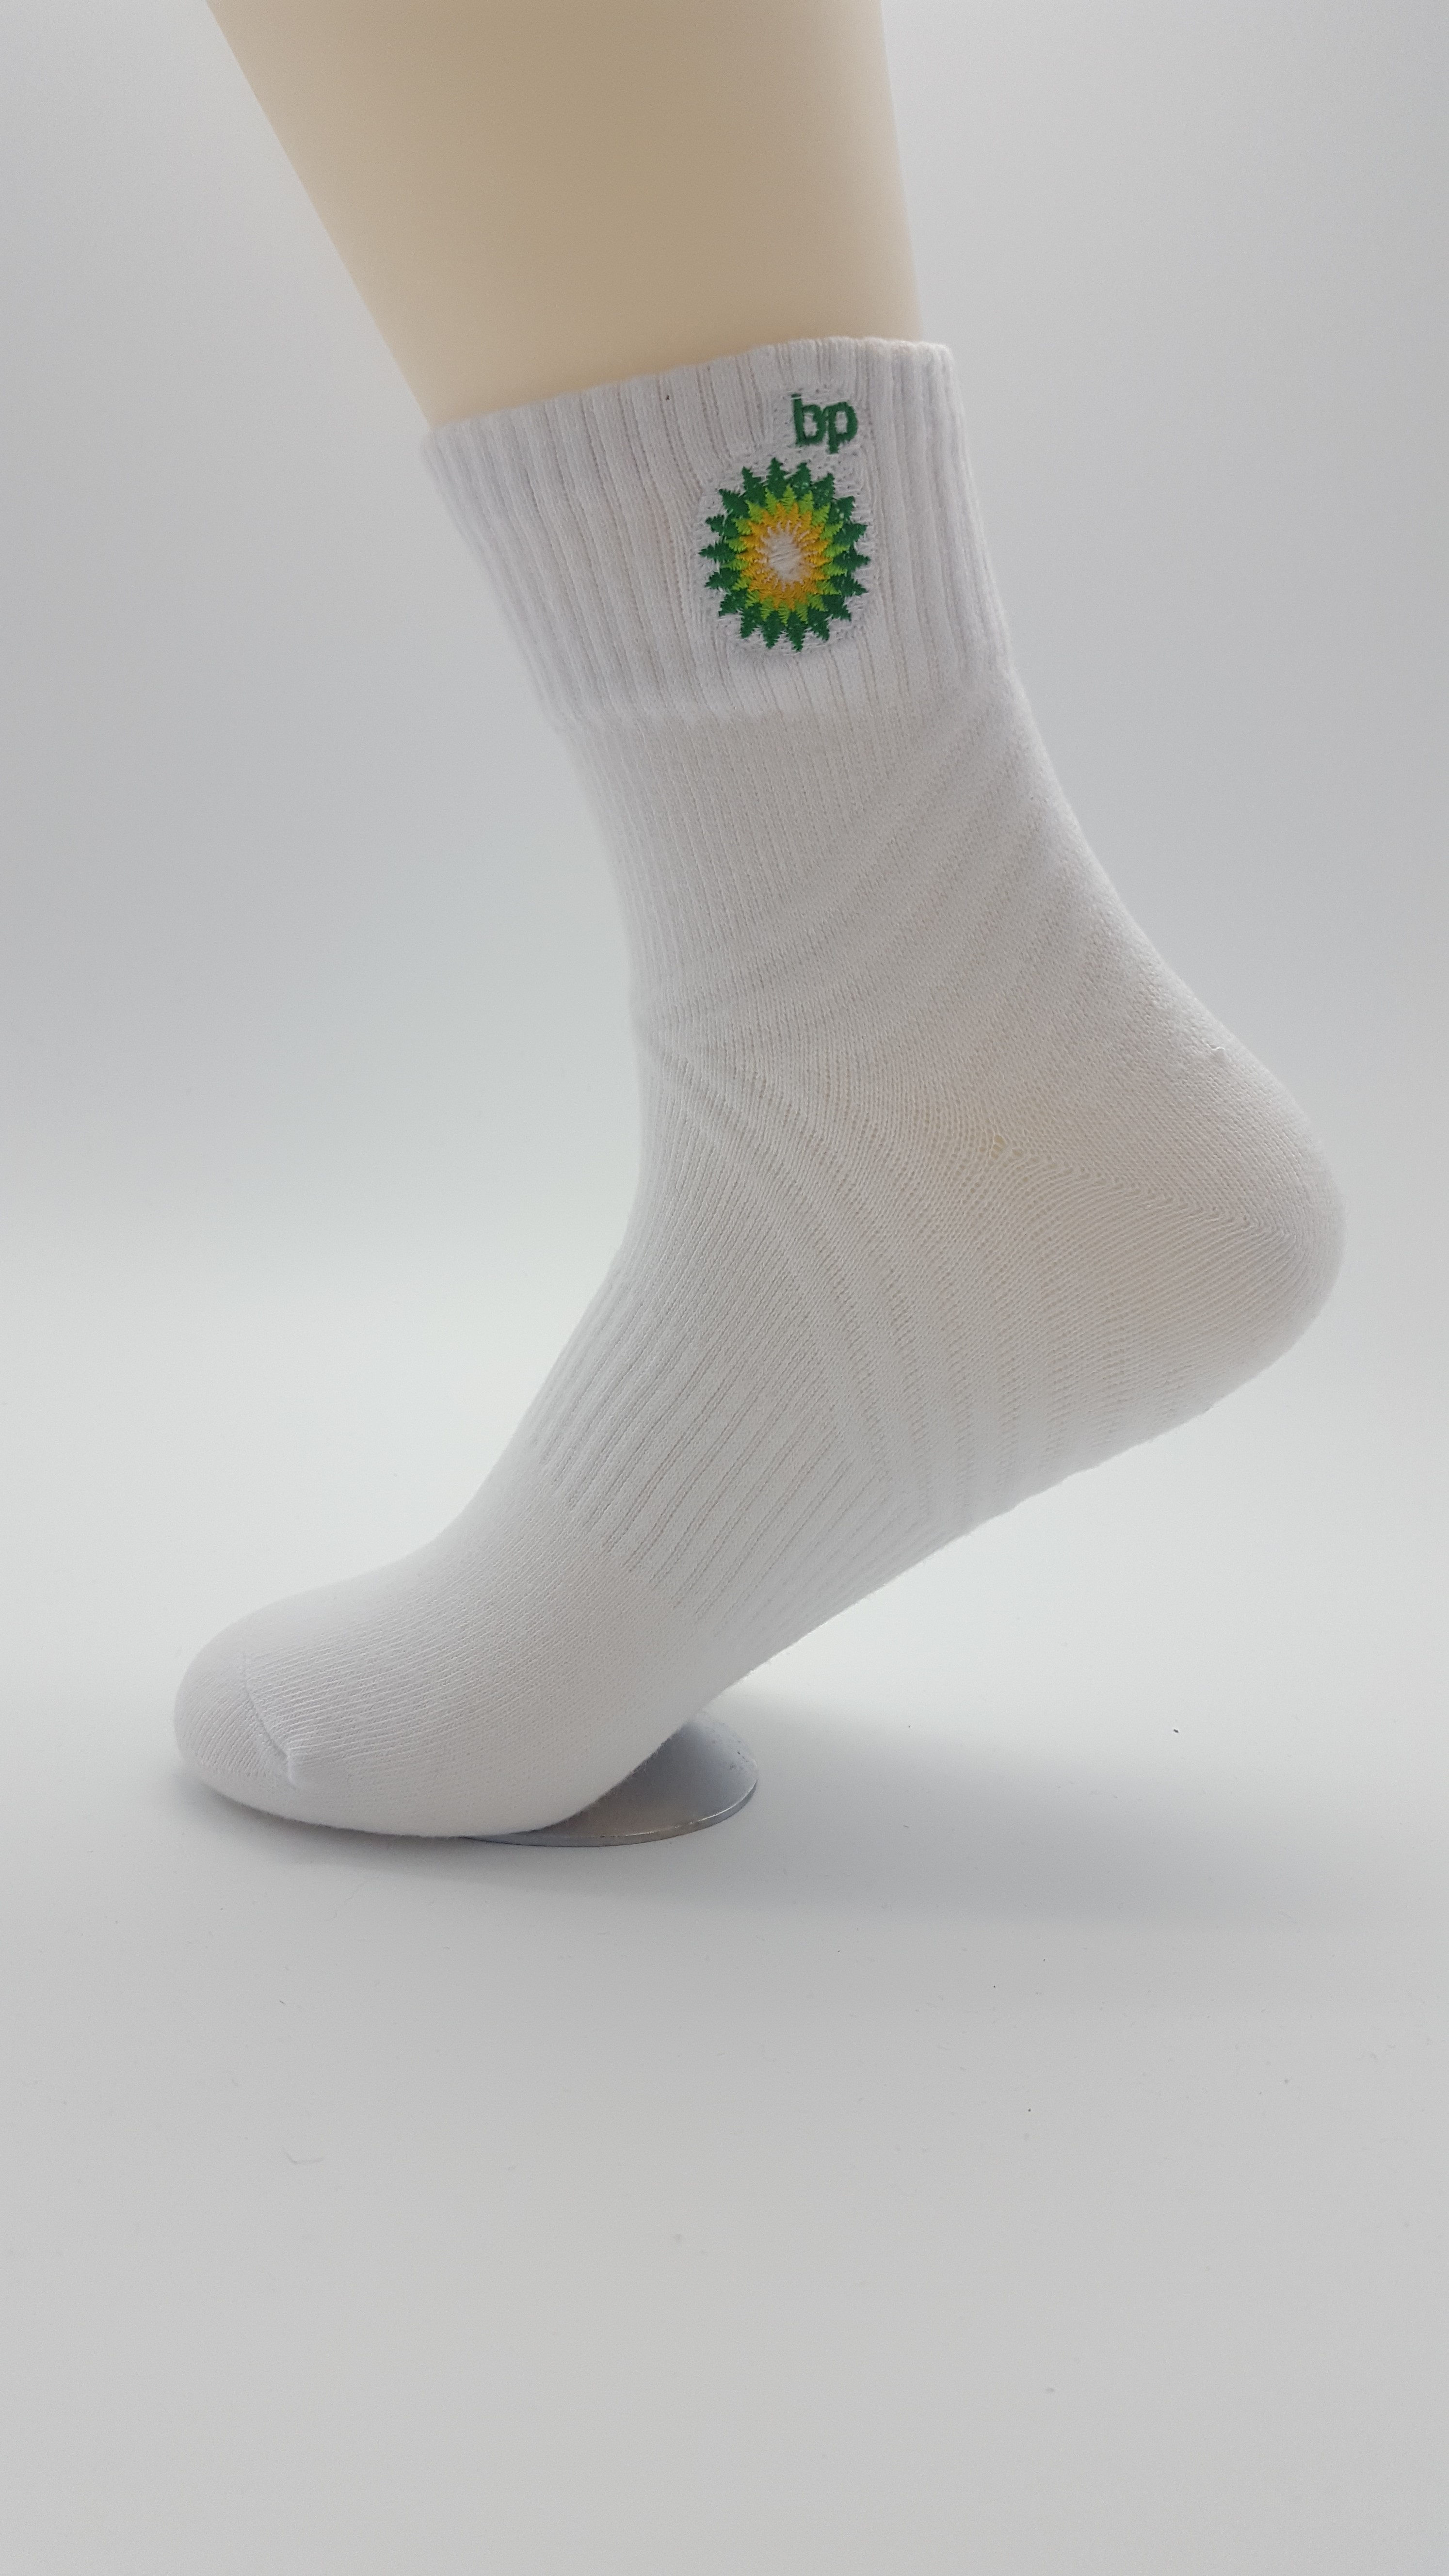 acf19807fb3df Custom Design Quarter Athletic Socks, FREE SHIPPING! - SM00254 | Sky ...